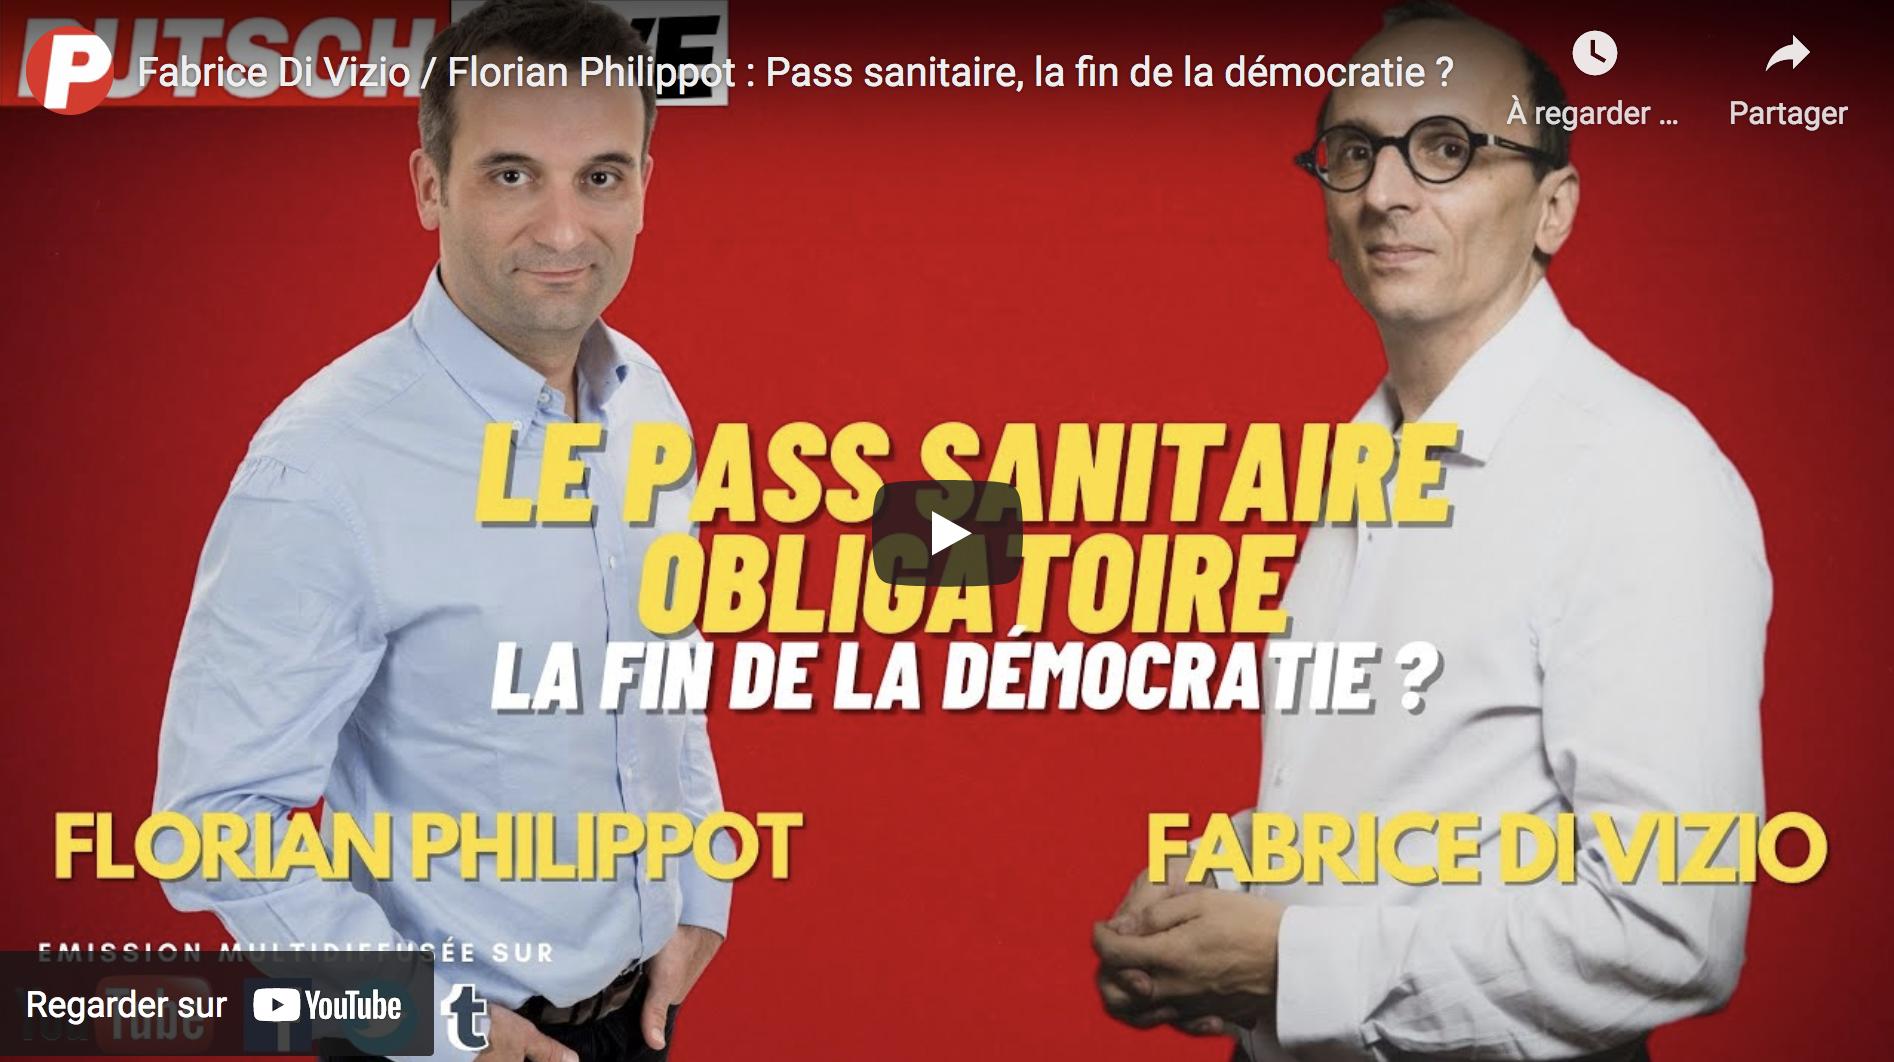 Fabrice Di Vizio / Florian Philippot : Pass sanitaire, la fin de la démocratie ? (VIDÉO)